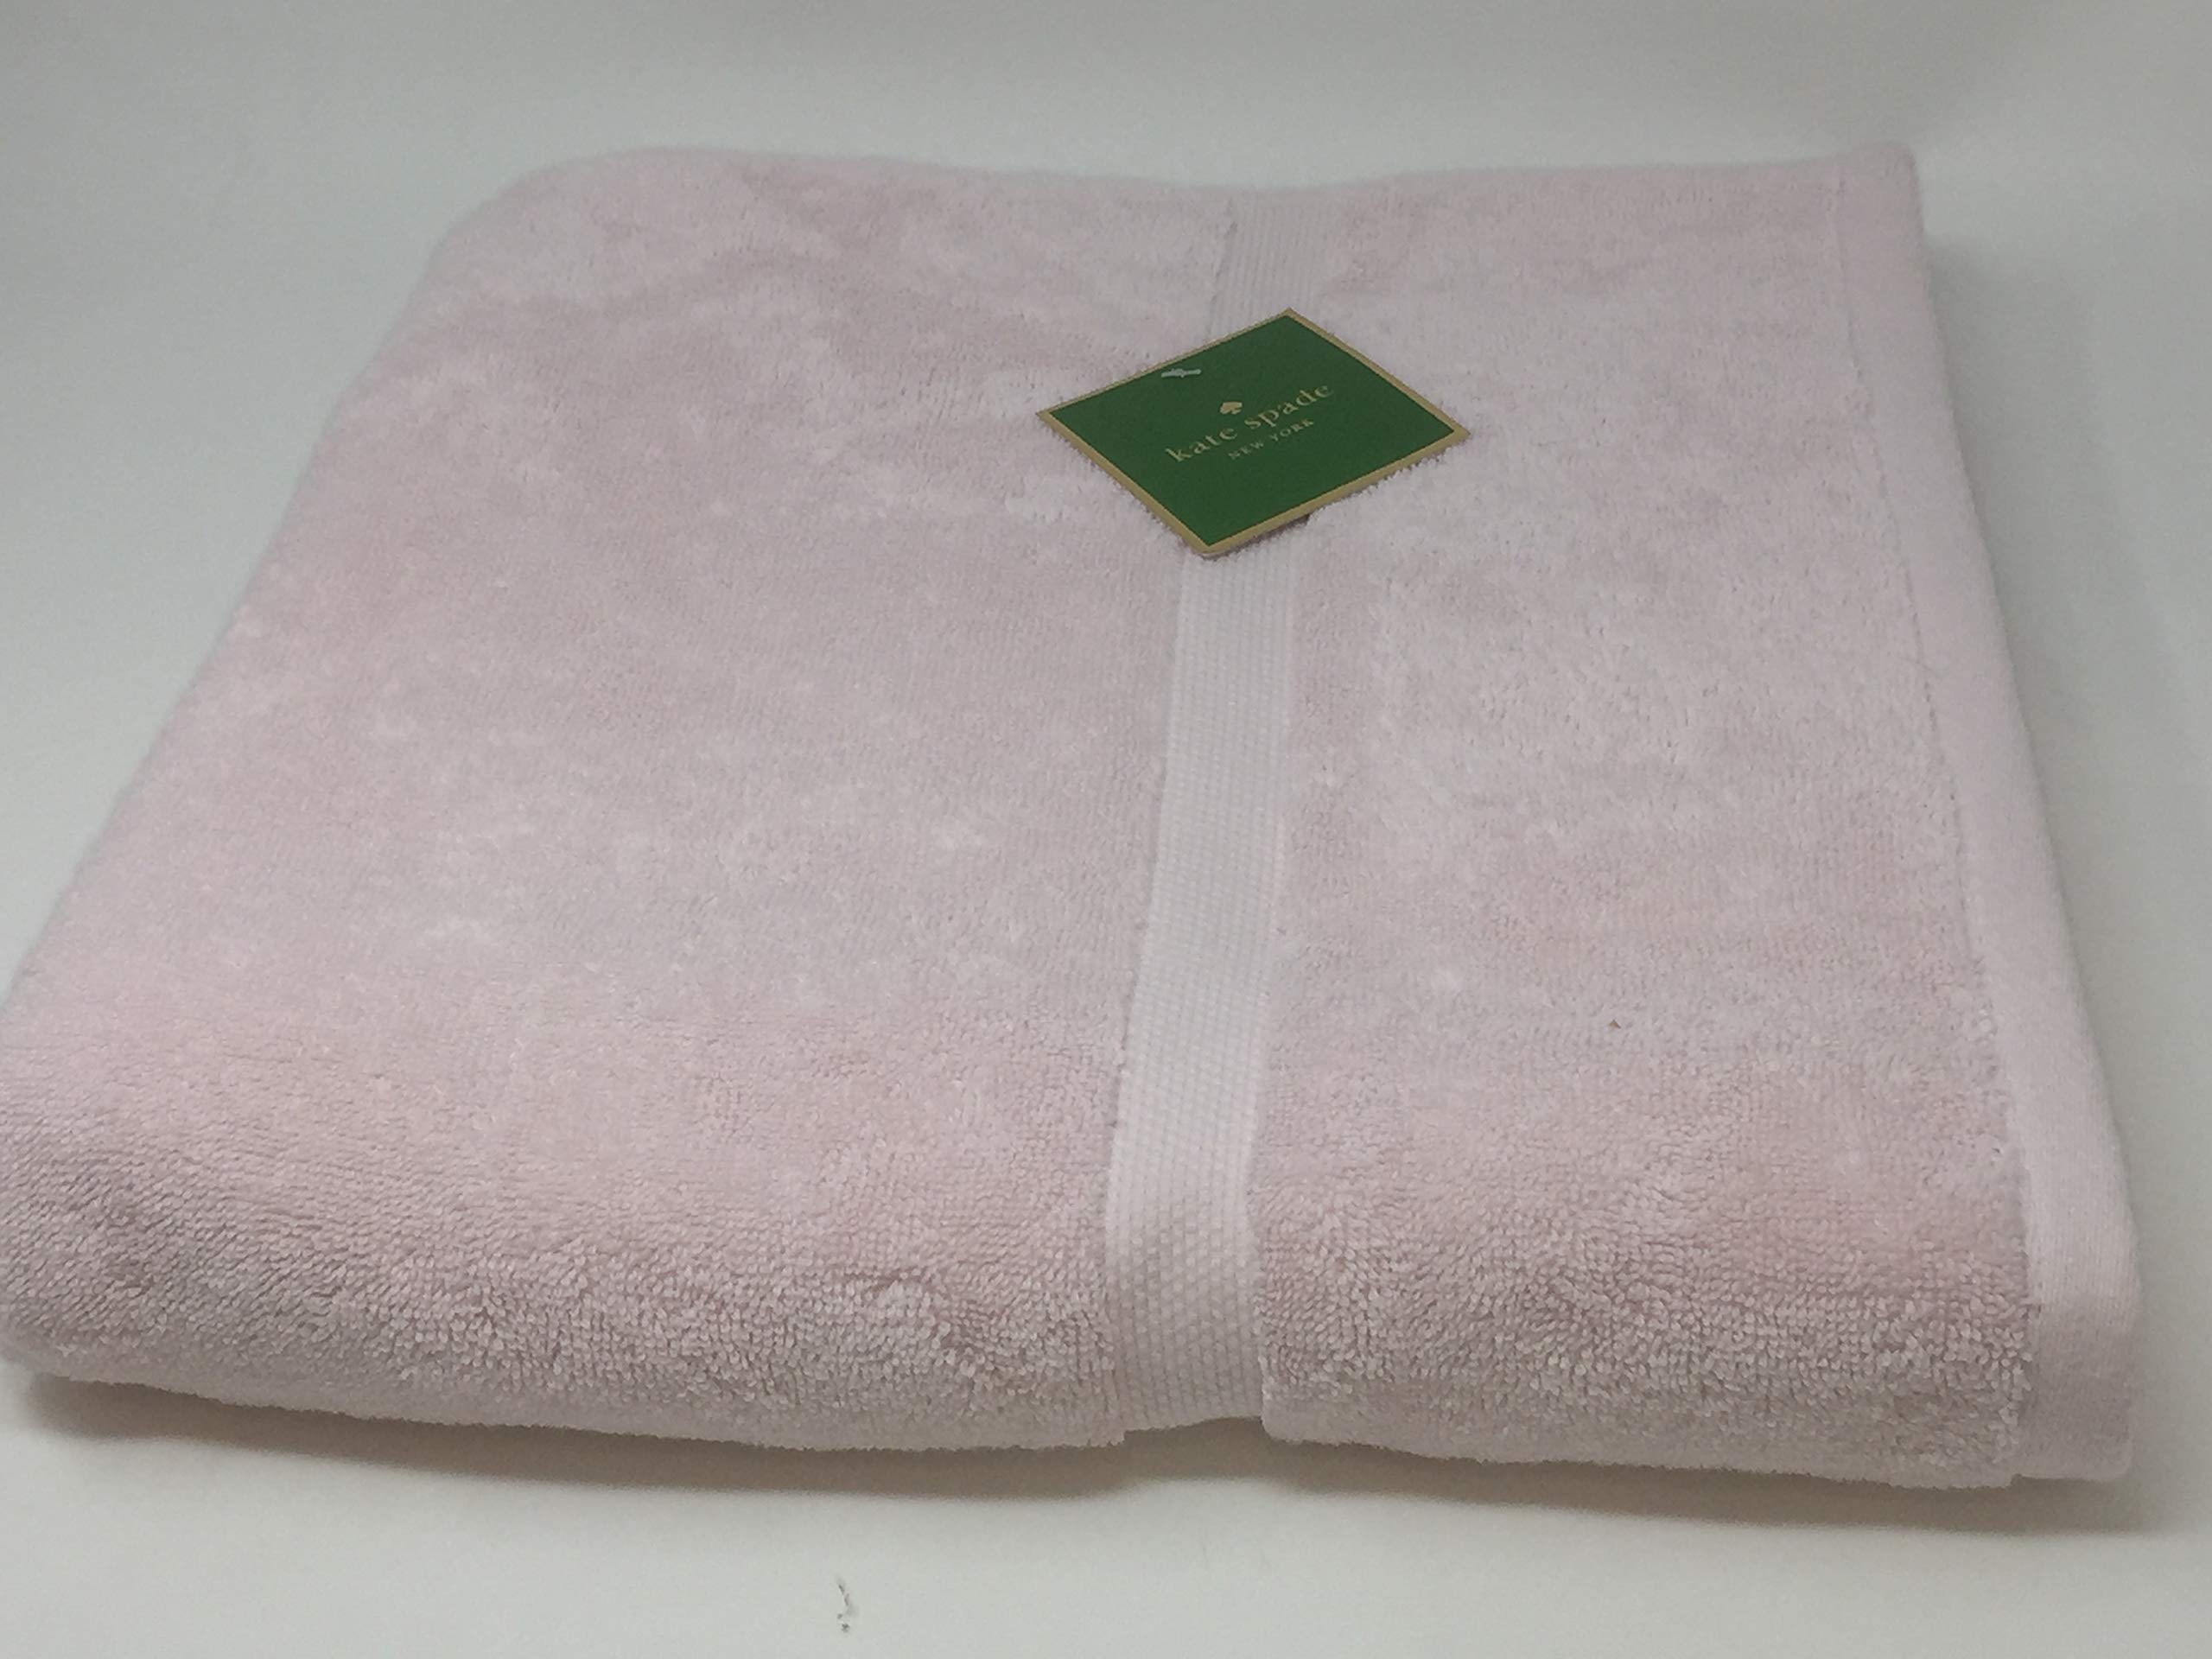 Kate Spade Light Pink Towel 6 Piece Set Bundle - 2 Bath Towels, 2 Hand Towels, 2 Washcloths by Kate Spade New York (Image #2)